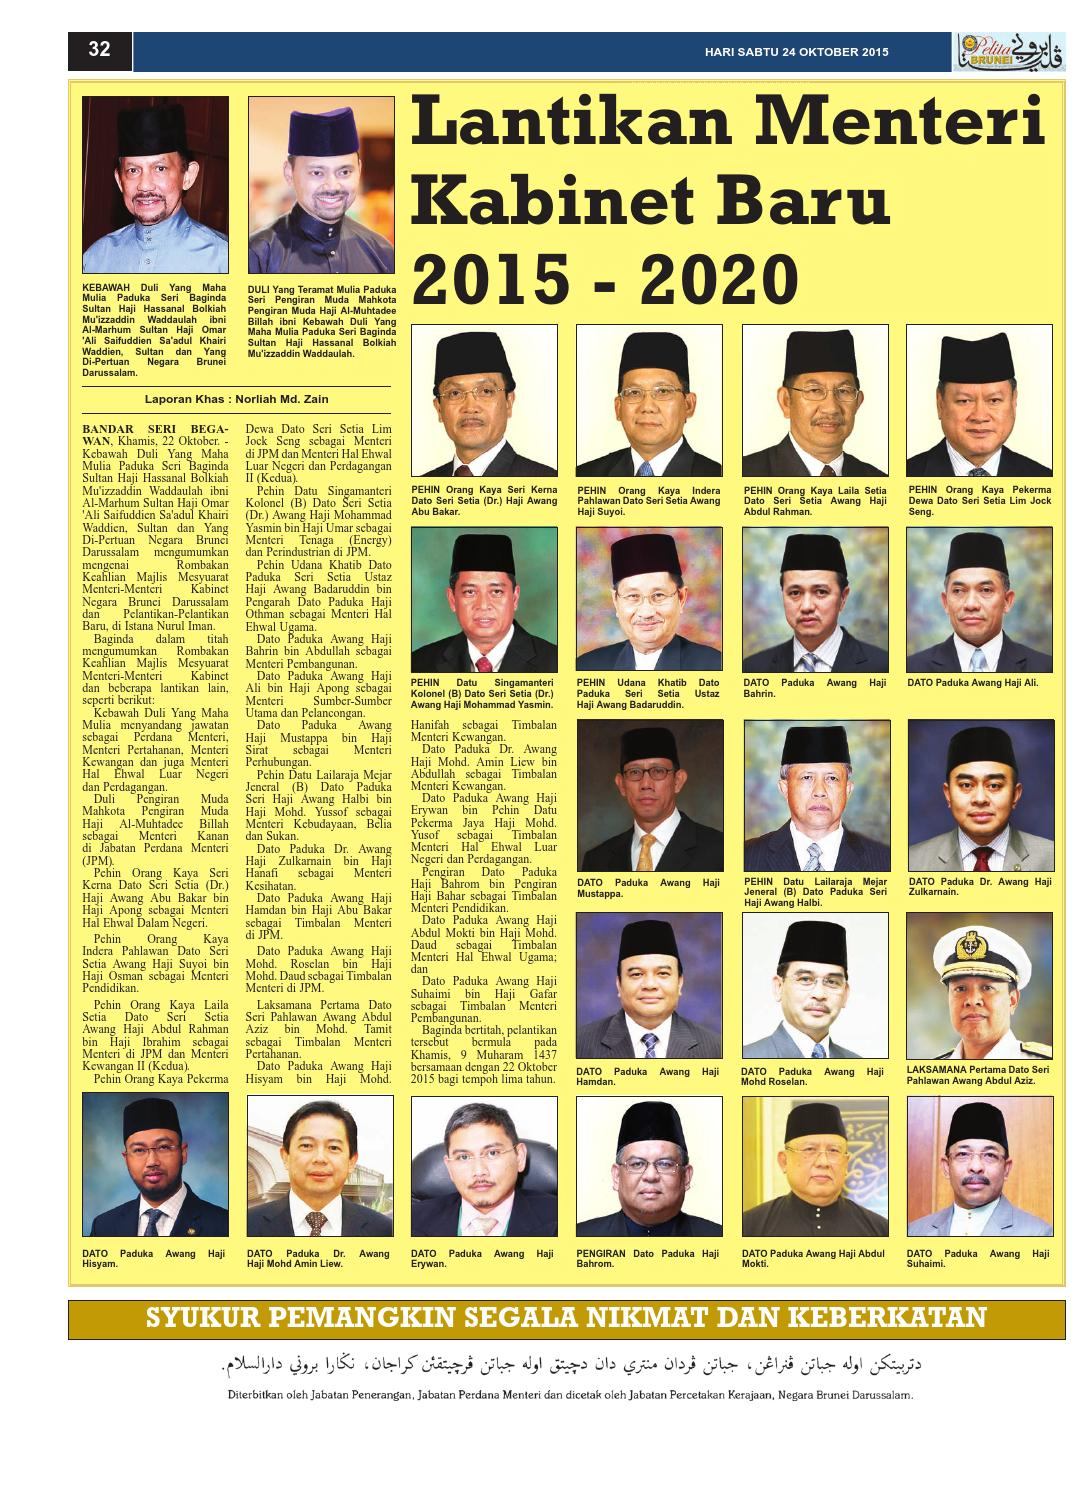 Pelita Brunei  Sabtu 24 Okt 2015 by Putera Katak Brunei